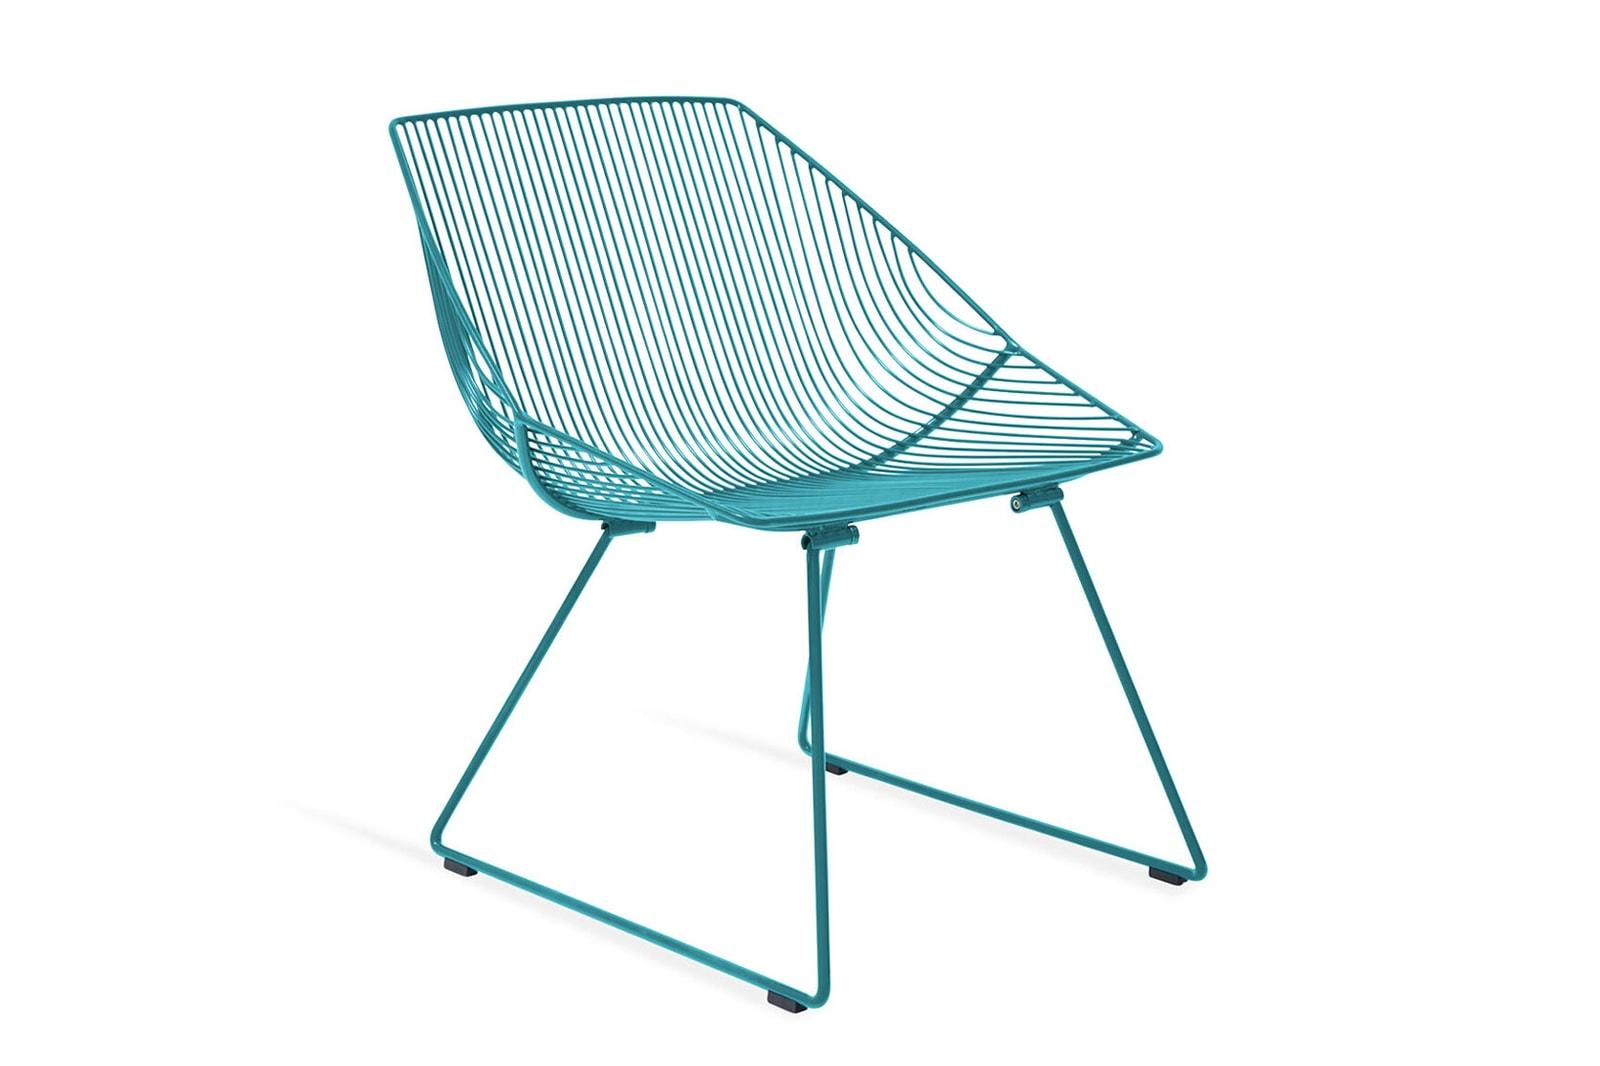 best accent chairs lounge stools seating modern home interior decor hay dims vitra Brdr. Krüger Ferdinand Danish Design Scandinavian